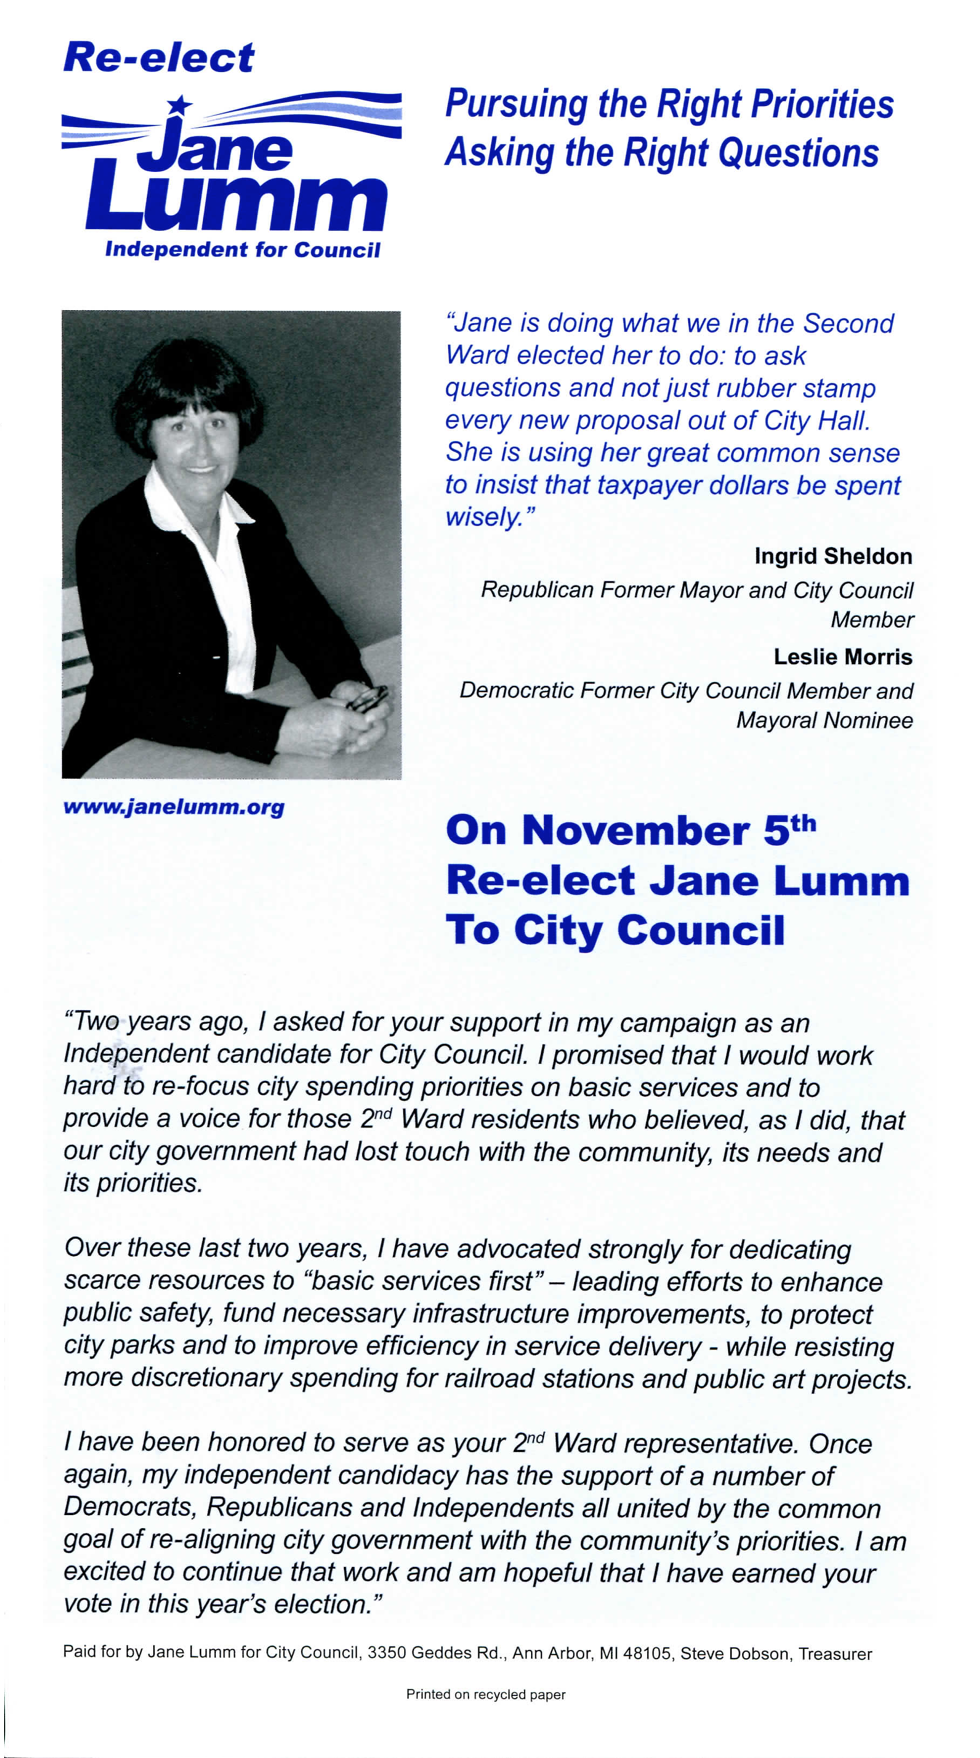 Palm Card Side 1 | Re-elect Jane Lumm